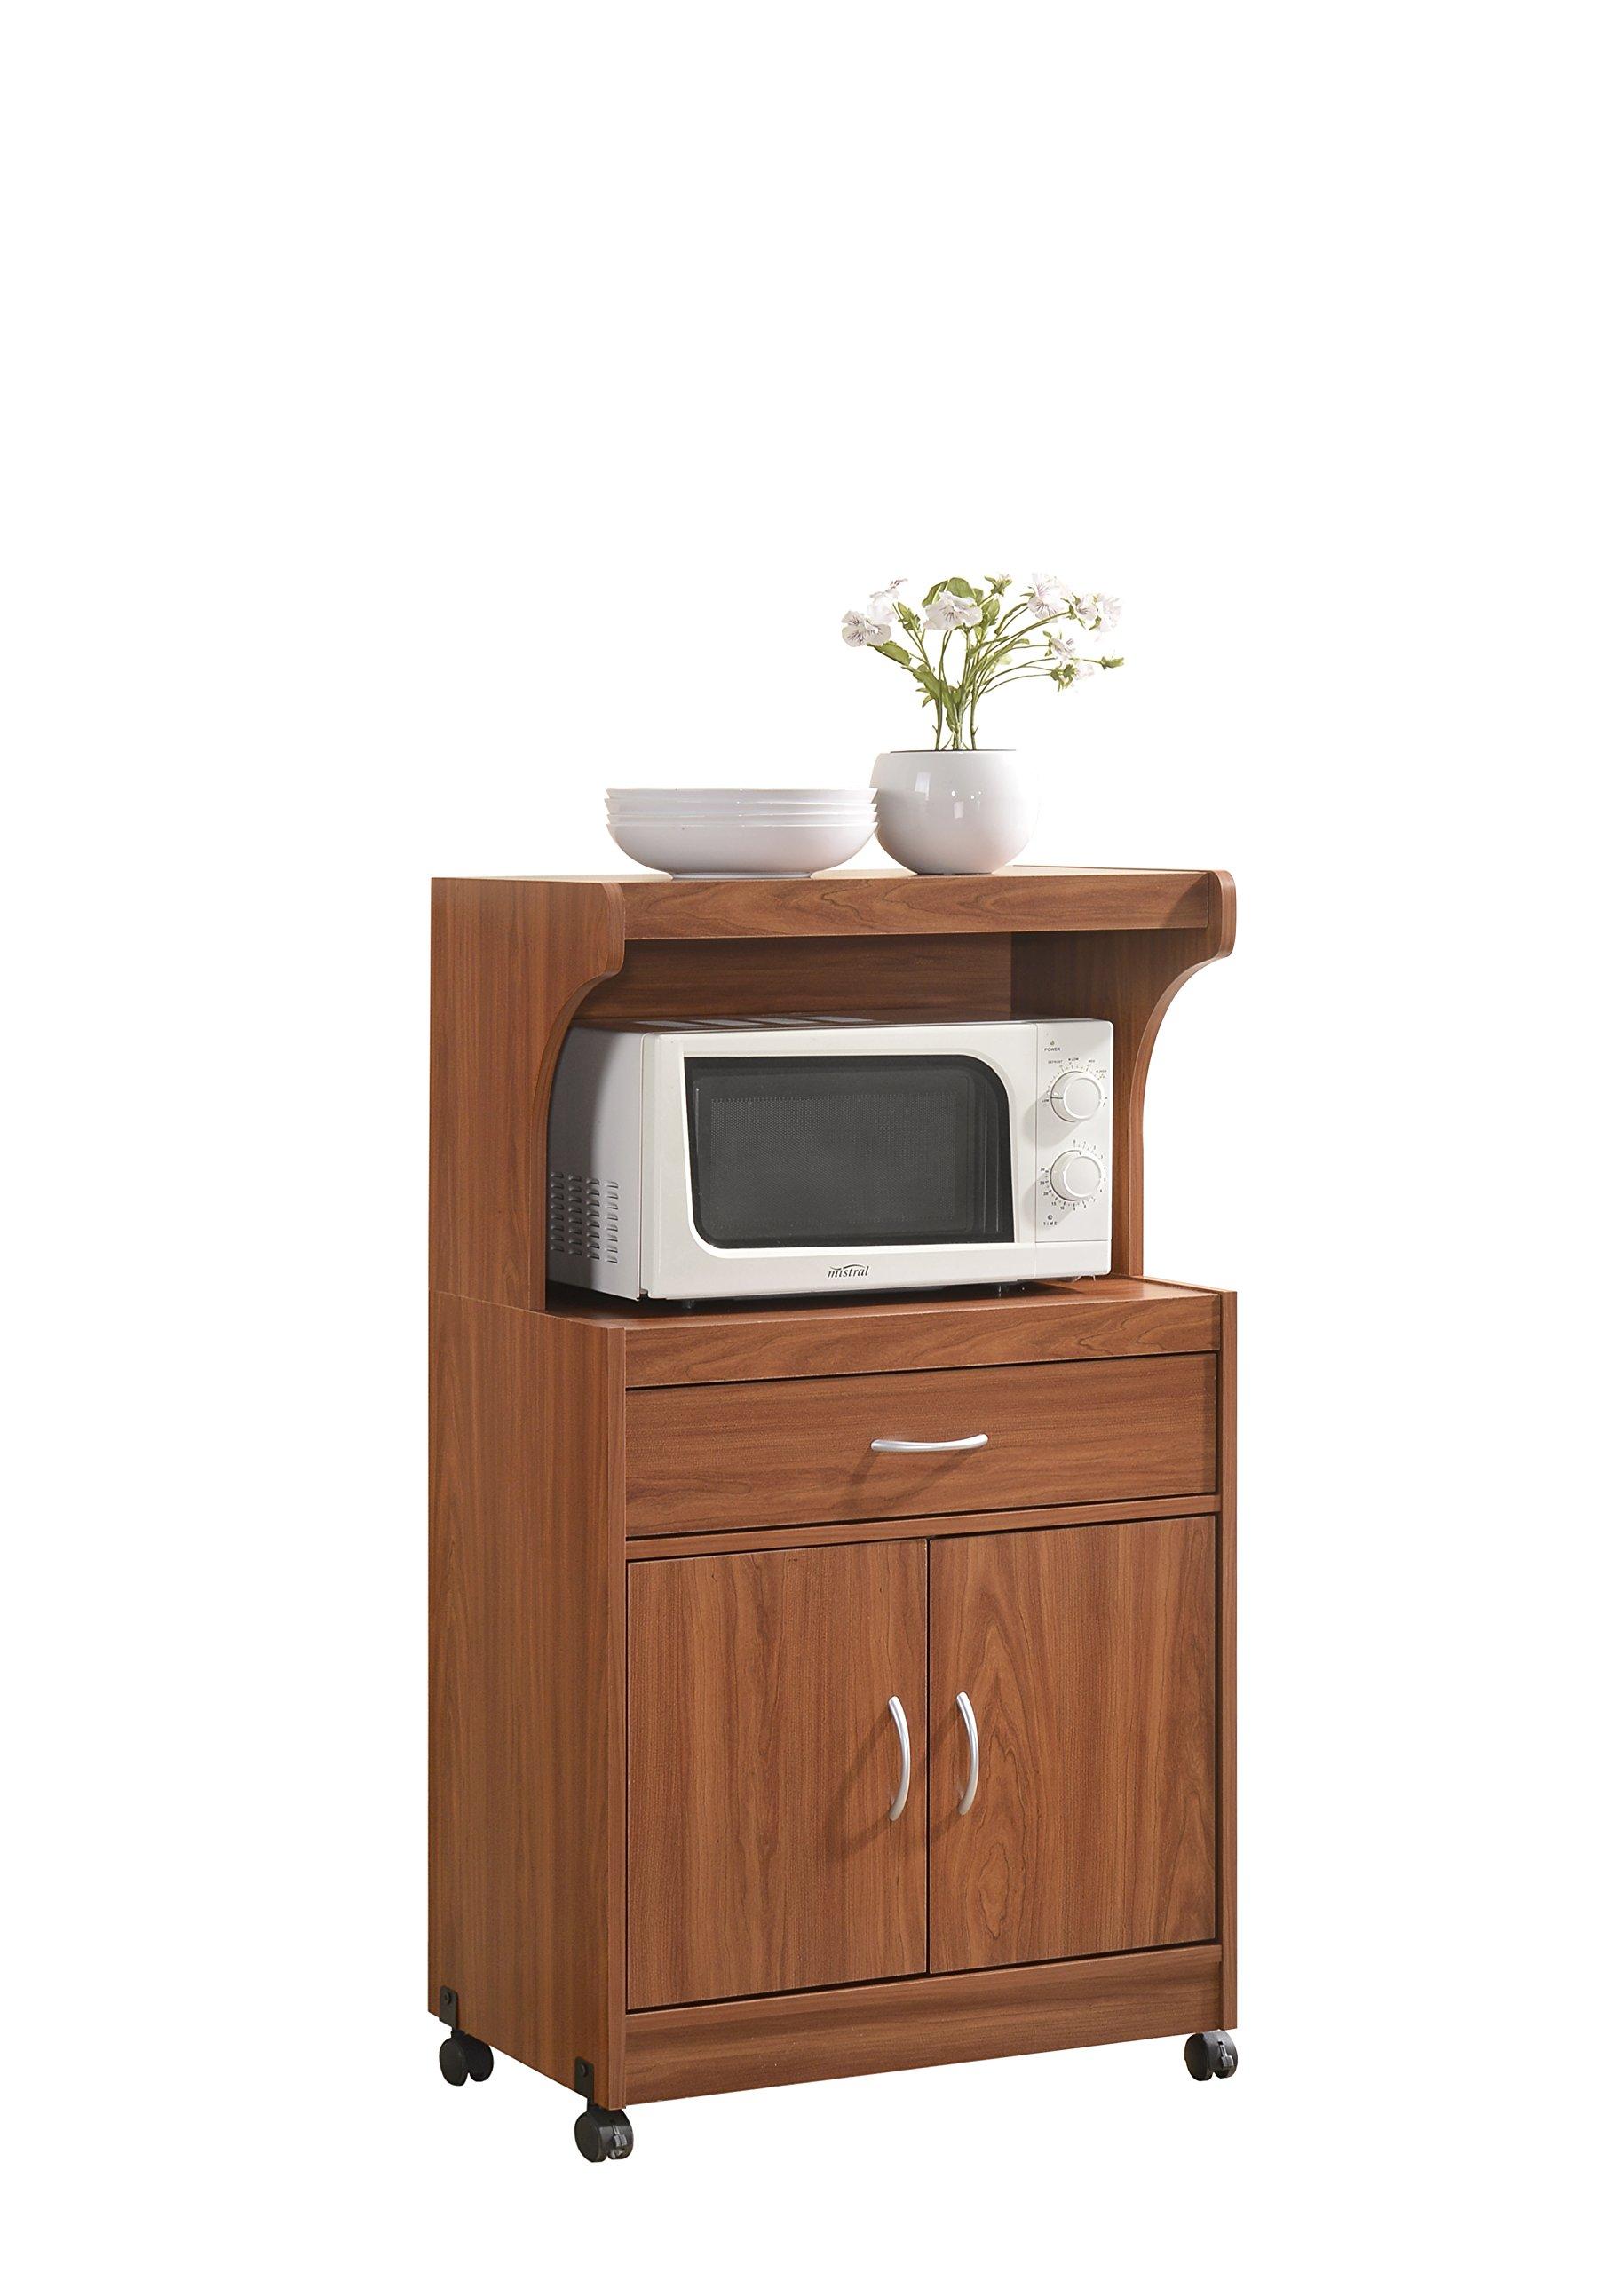 cherry kitchen cart sm appliances cheap find deals on line at get quotations hodedah microwave